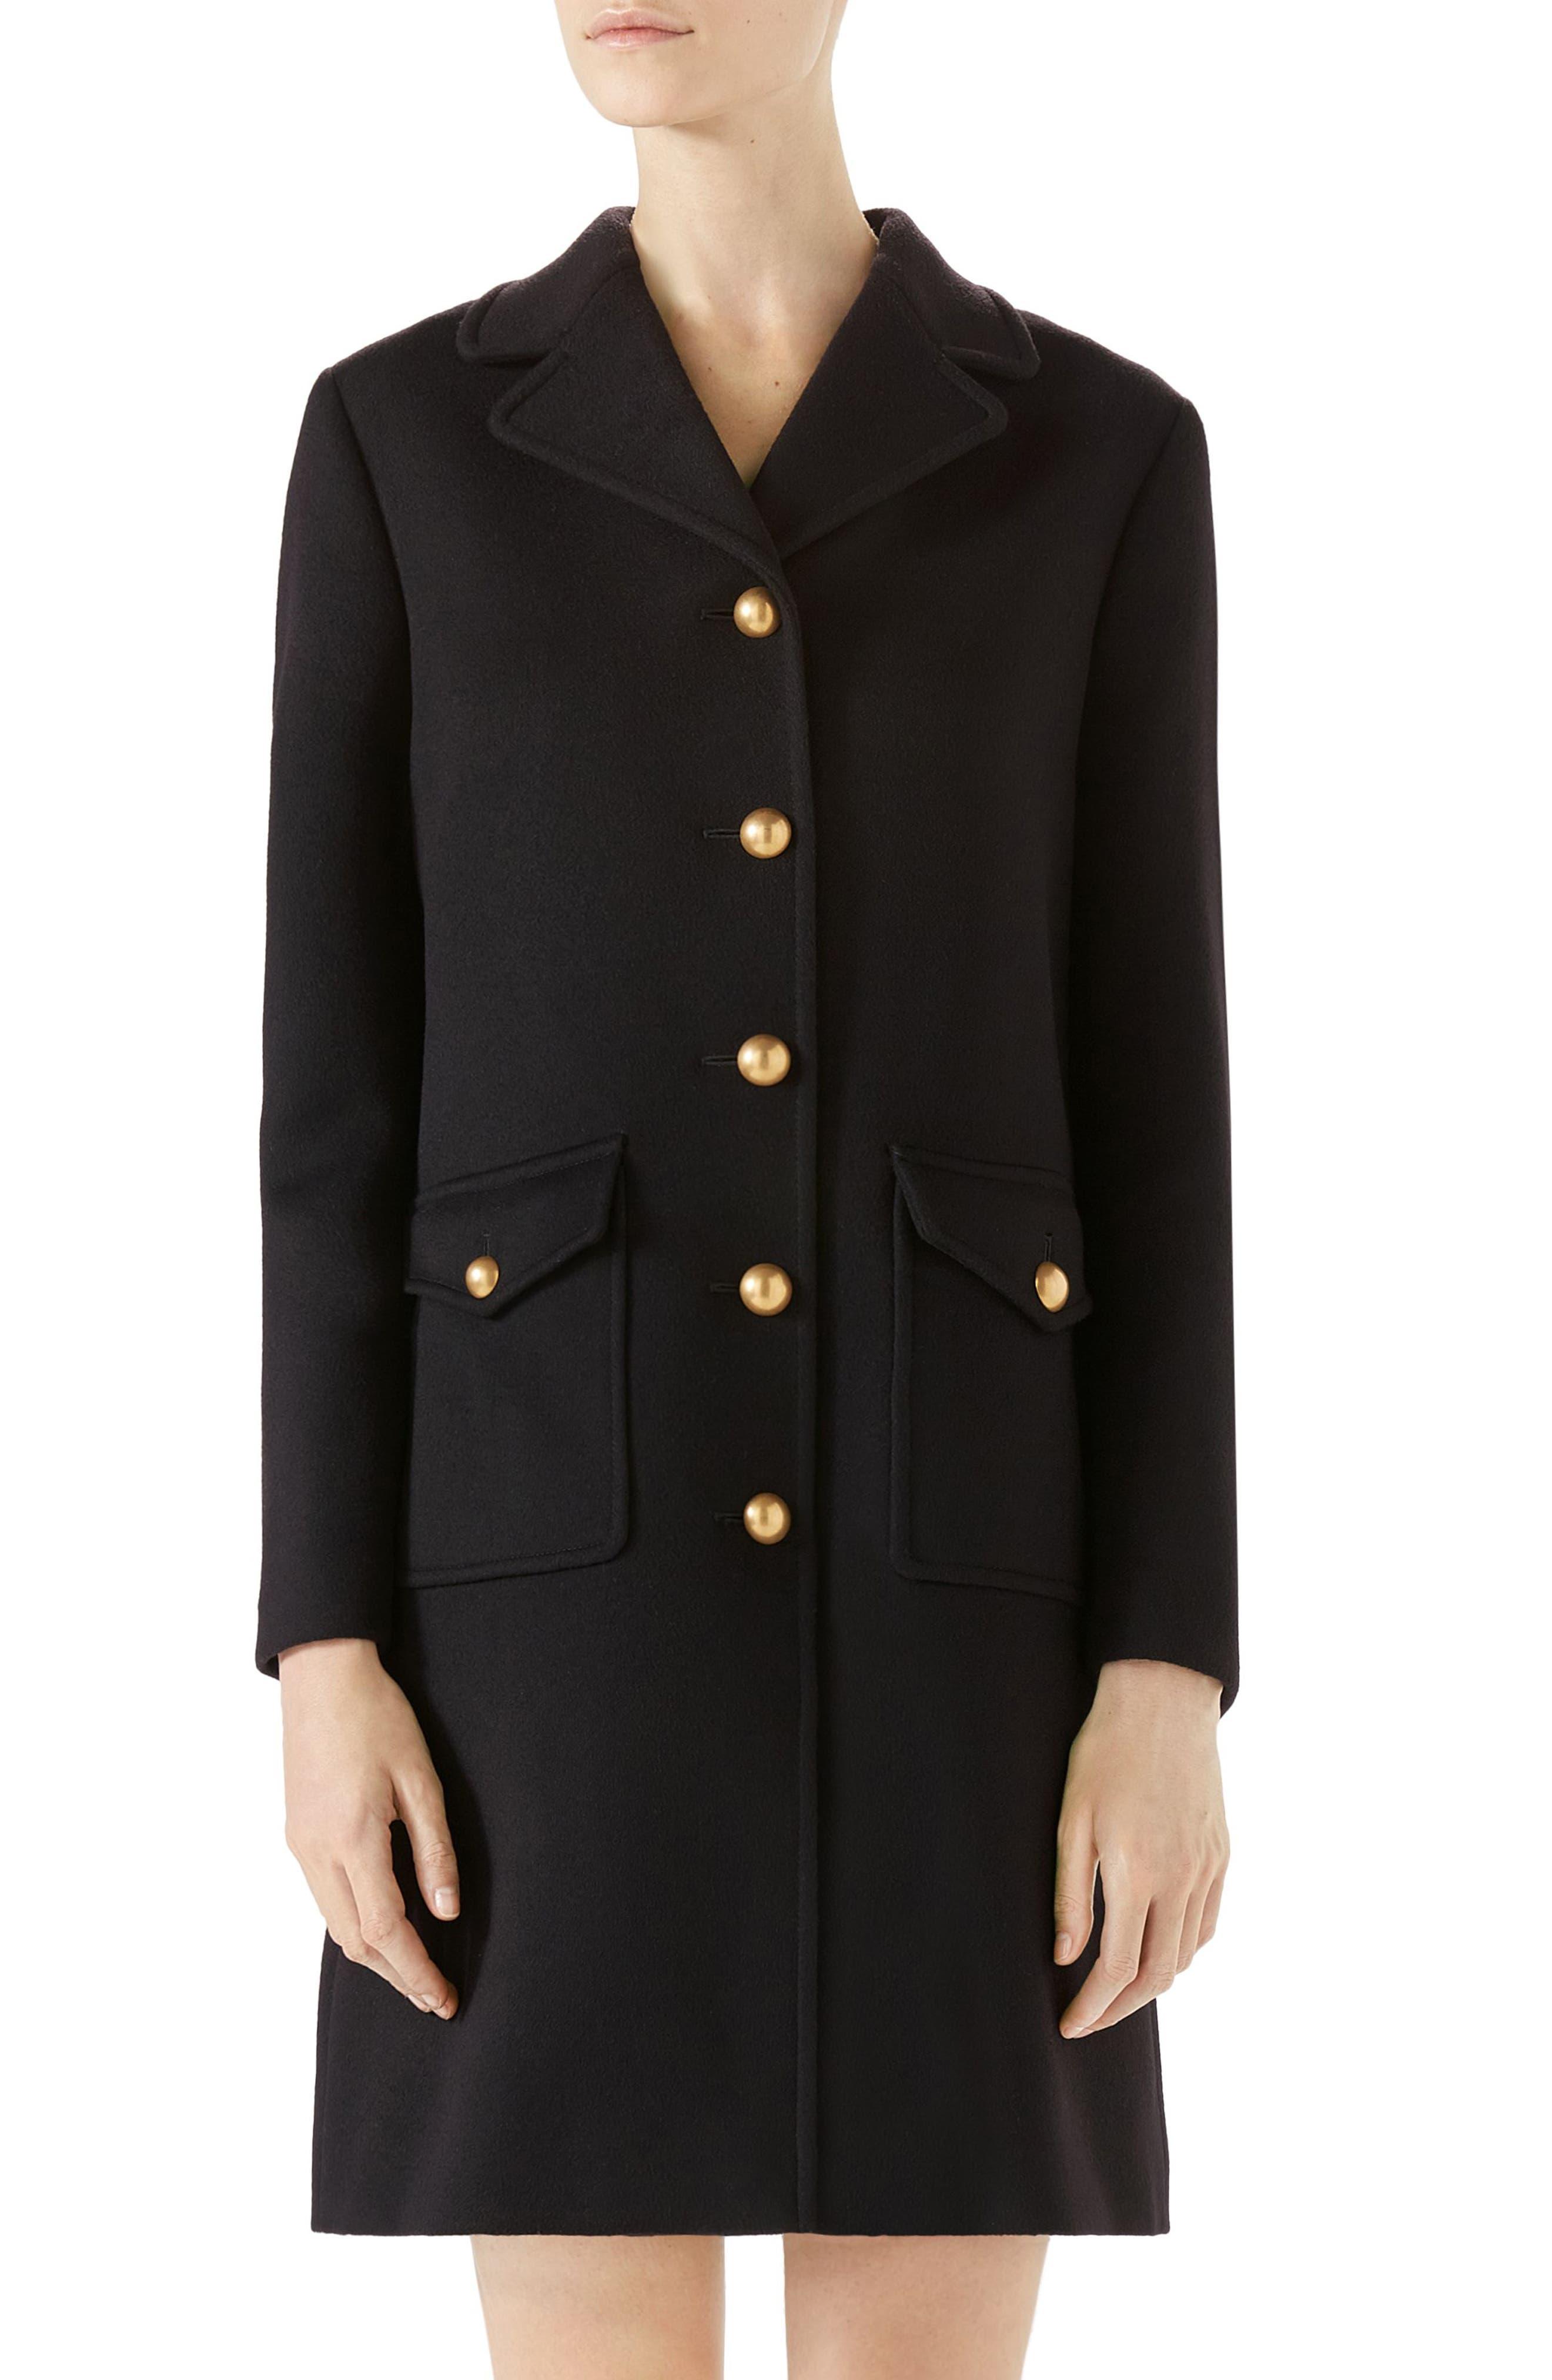 GG Wool Coat,                             Main thumbnail 1, color,                             Black